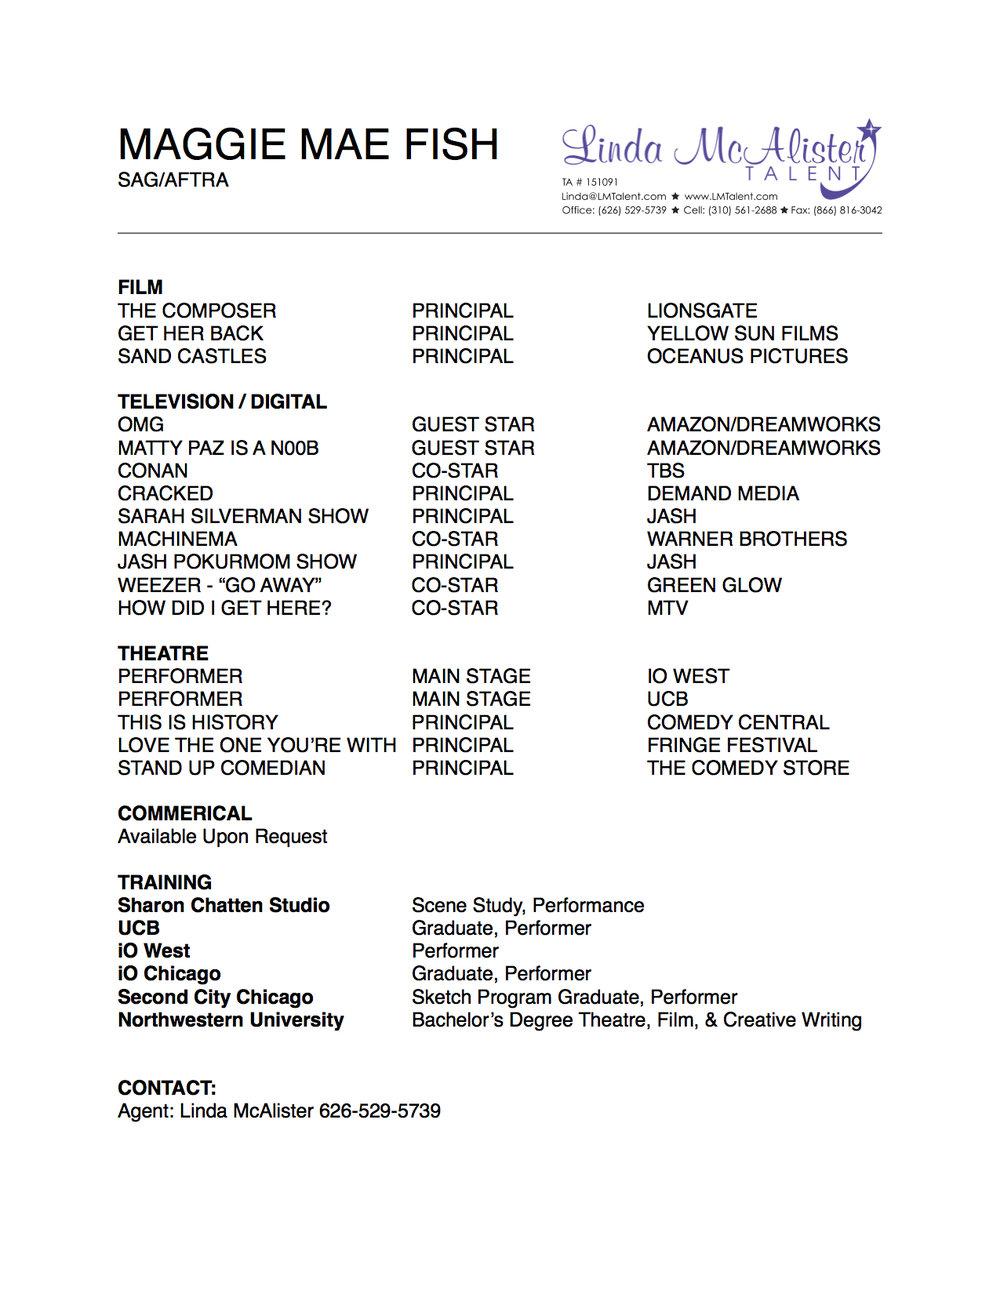 Maggie Mae Fish - Resume.jpg